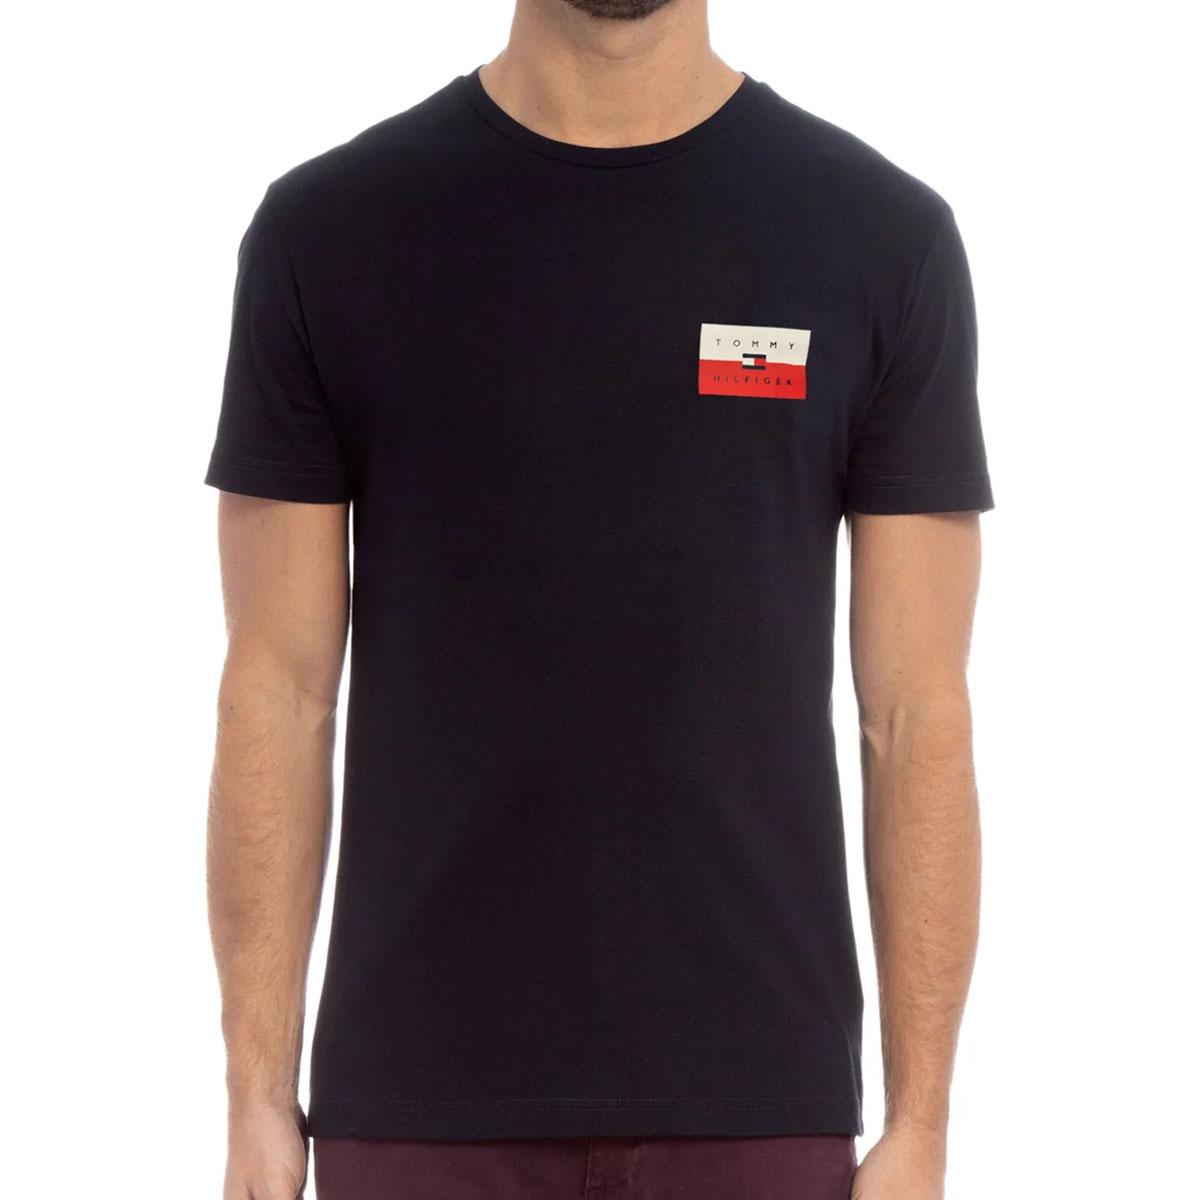 Camiseta Tommy Hilfiger Small Chest Box Azul Marinho